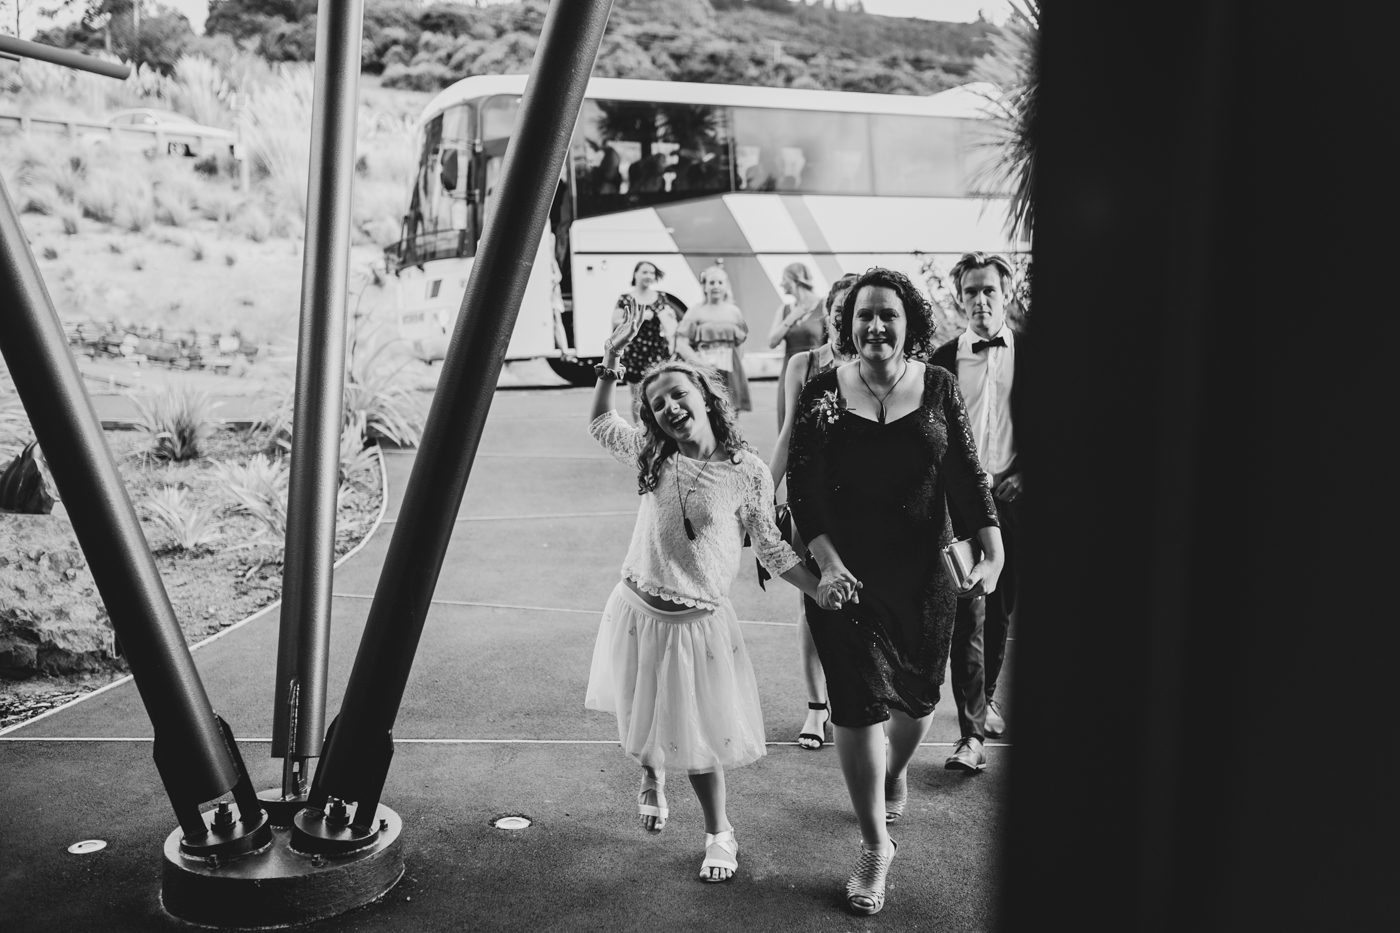 Ariana & Tim - Dunedin, New Zealand Wedding - Destination Wedding - Samantha Heather Photography-222.jpg